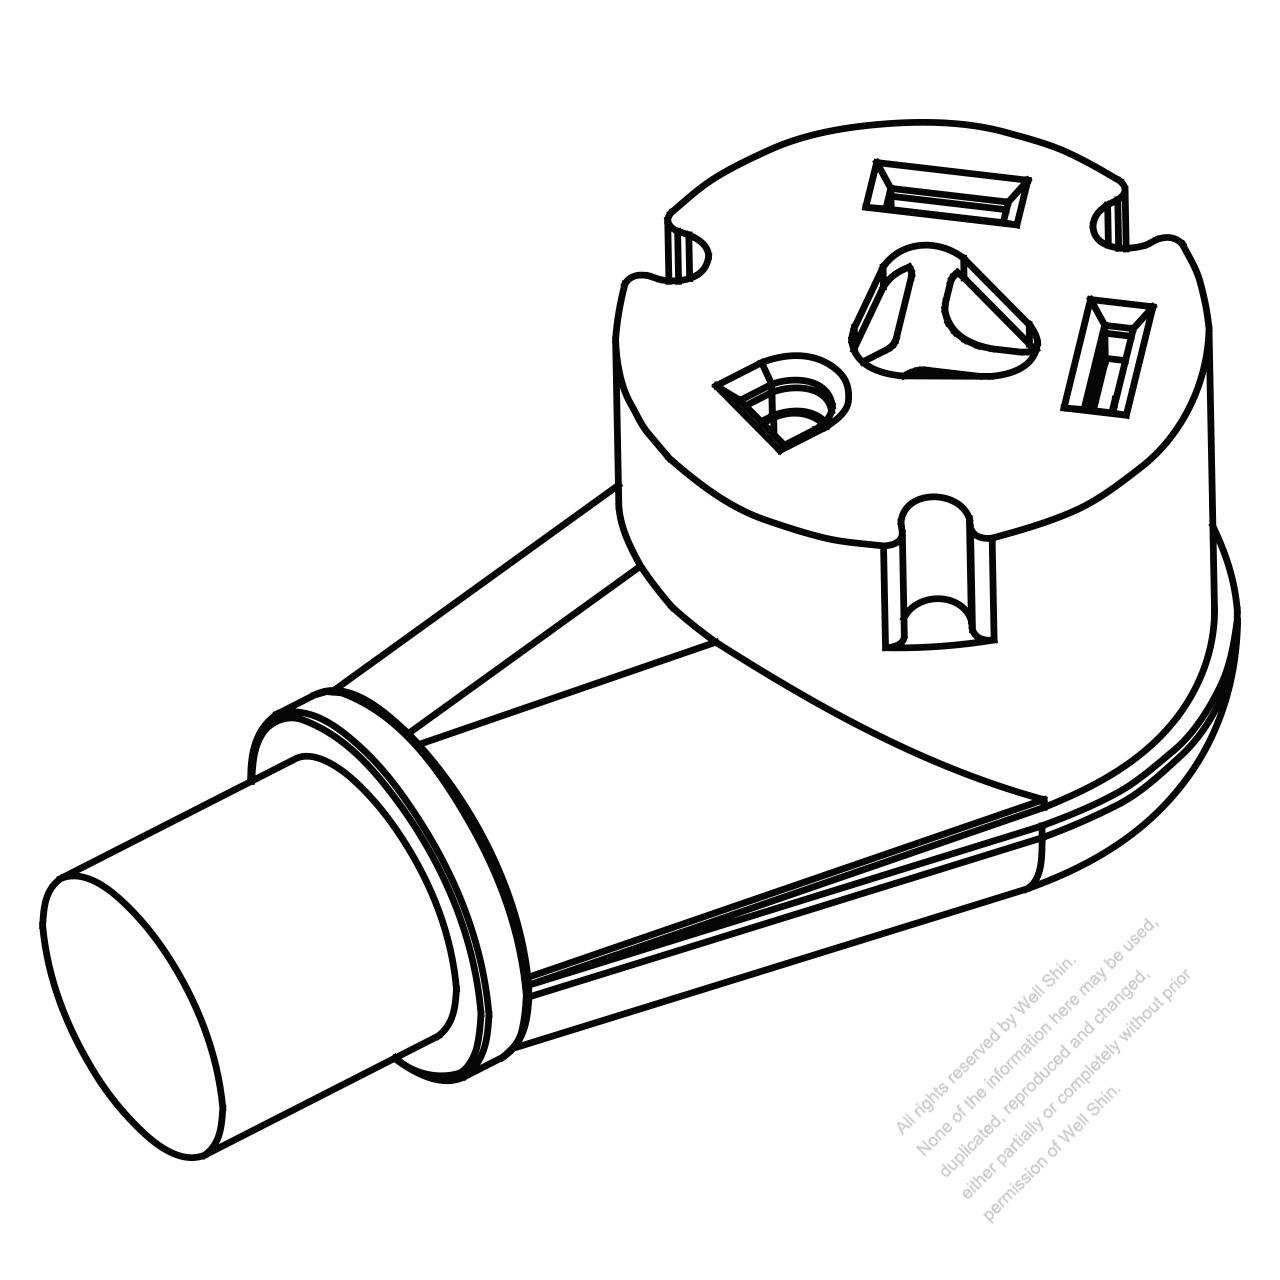 rv connector 3 pin (nema tt 30r) straight blade, 2 p, 3 wirerv connector 3 pin (nema tt 30r) straight blade, 2 p